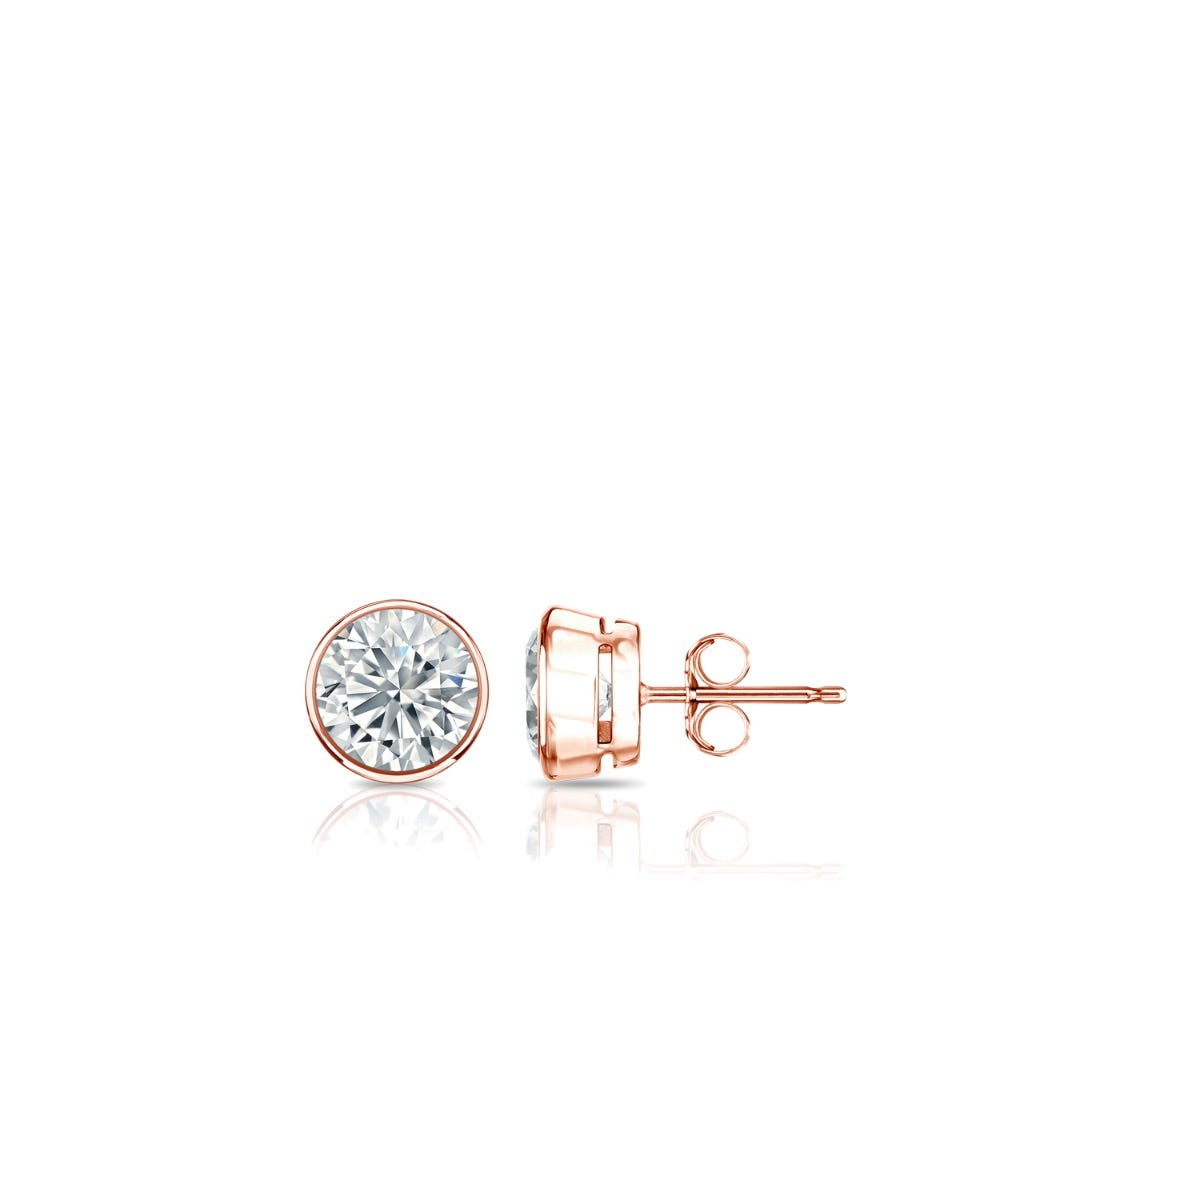 Diamond Round Bezel-Set 1/5ctw. Solitaire Stud (IJ-VS2) Earrings in 14K Rose Gold